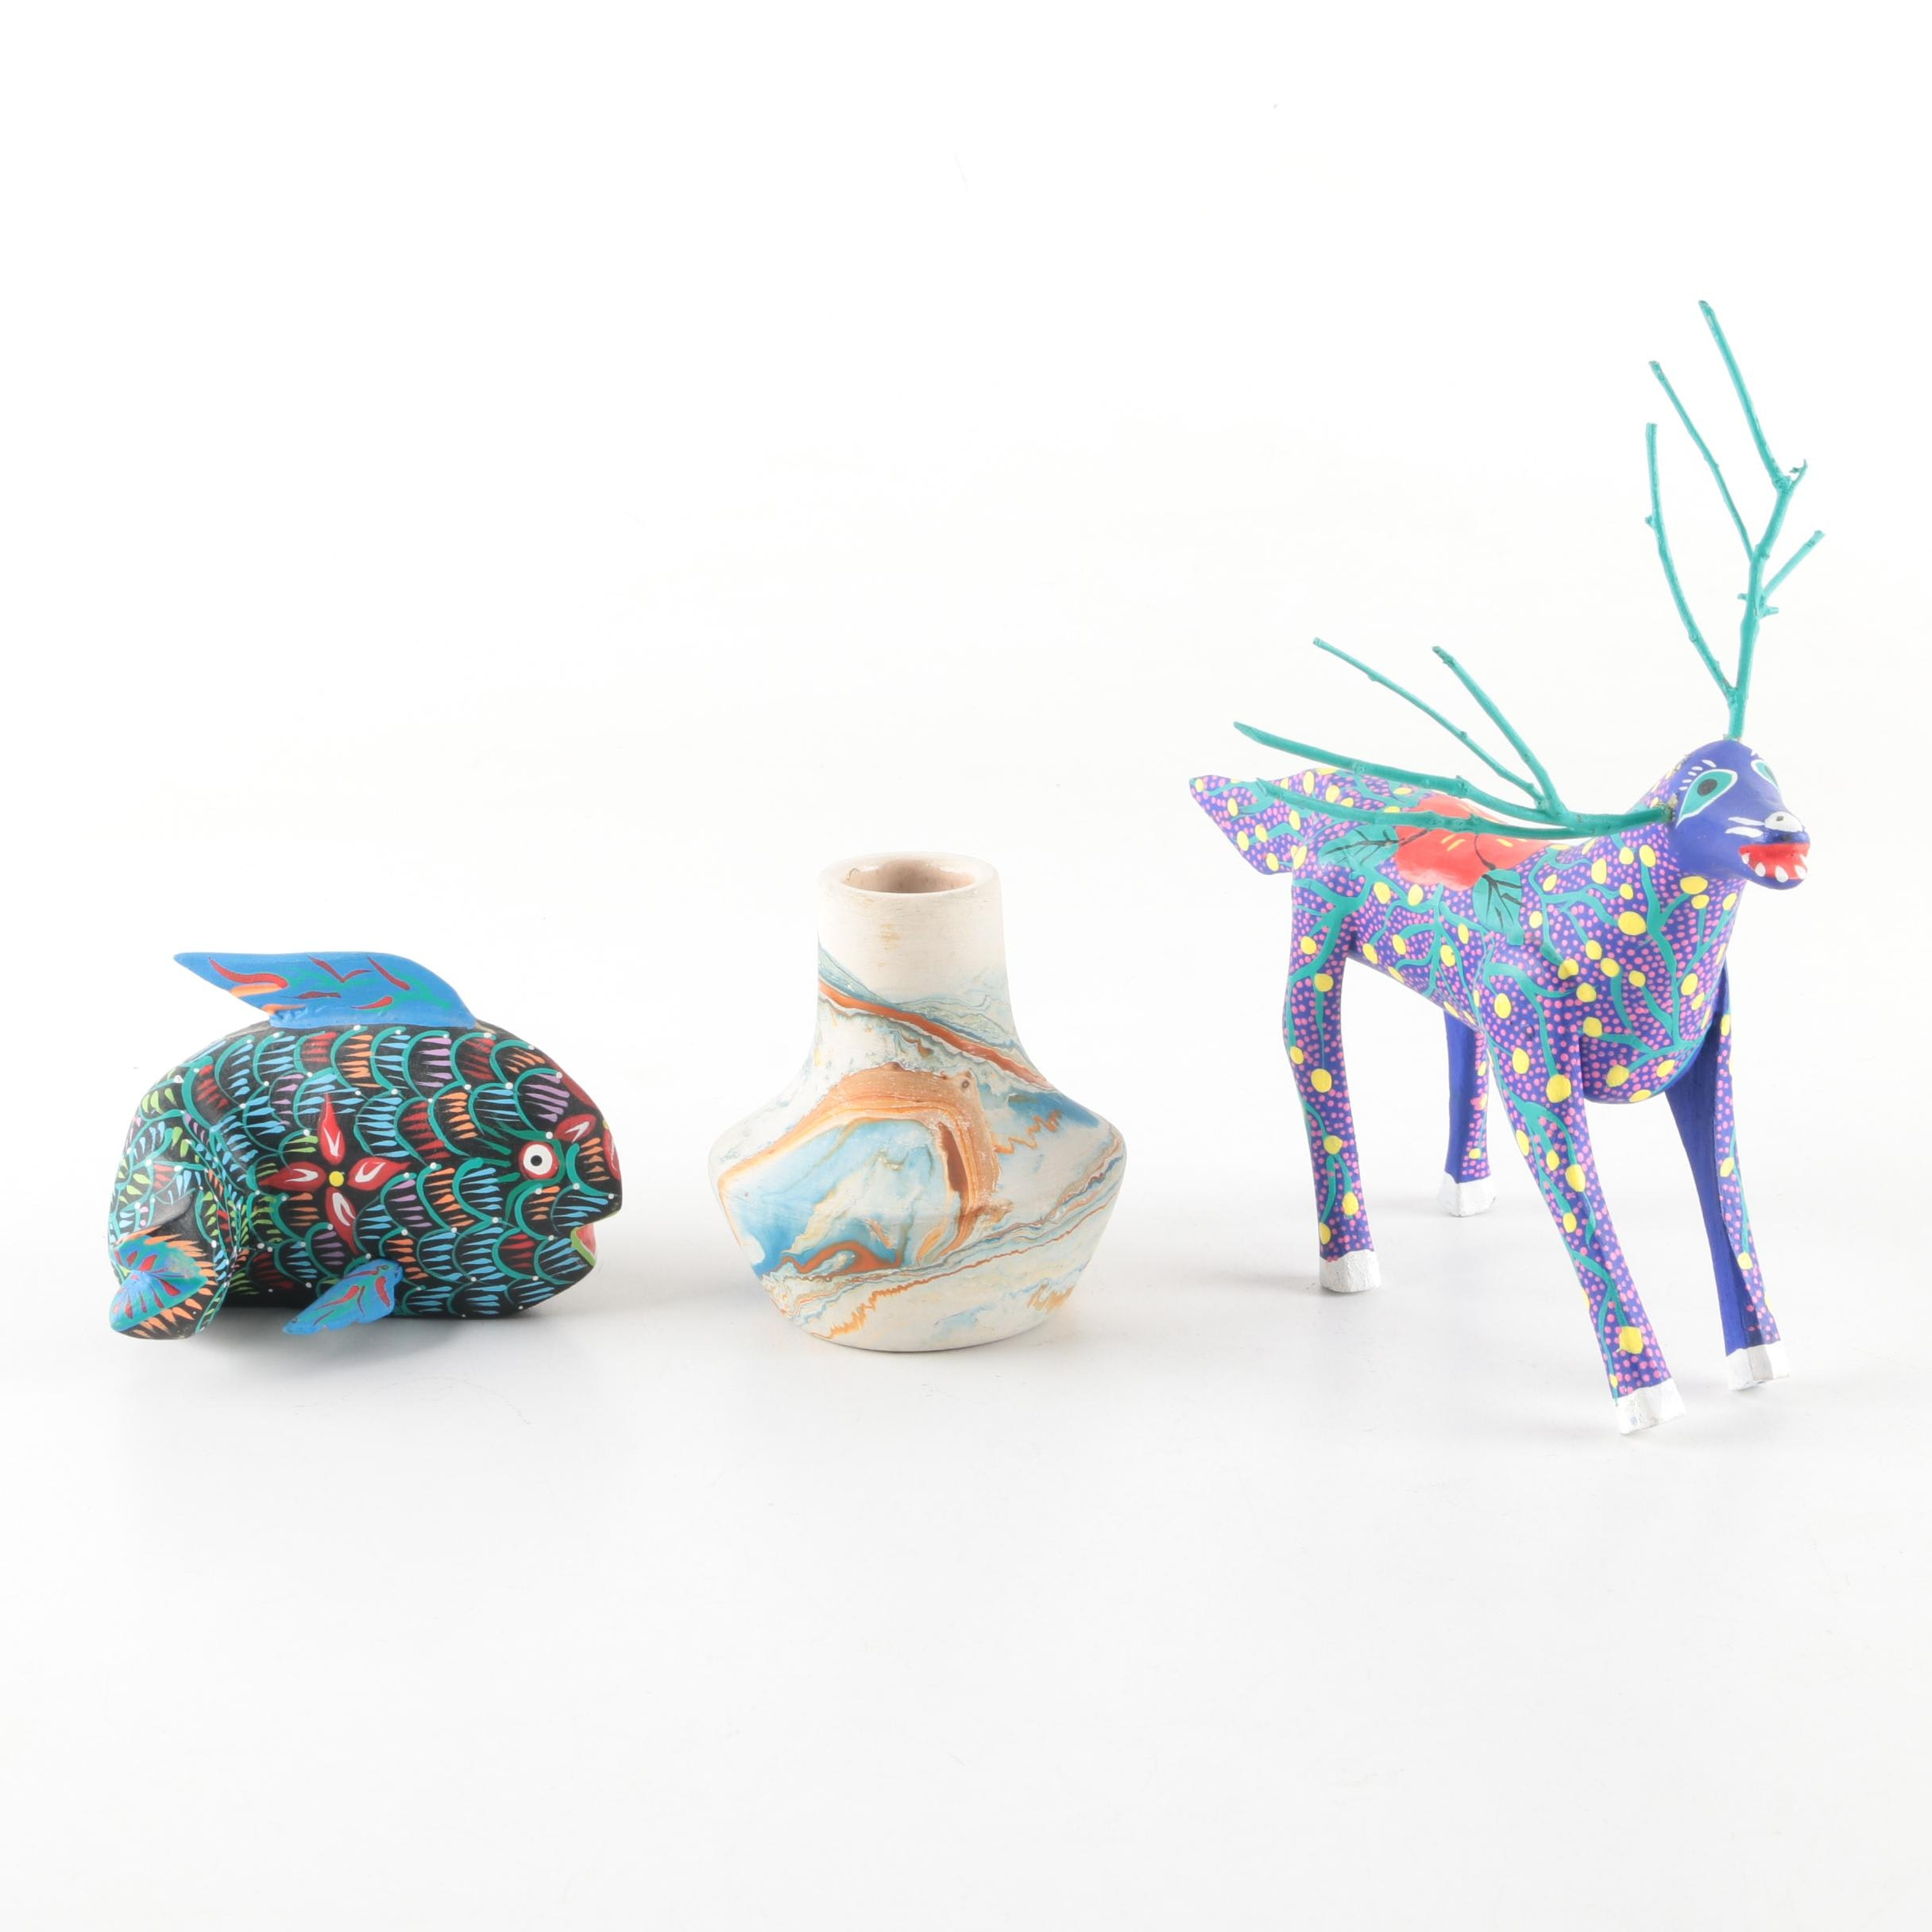 Signed Oaxacan Handmade Folk Art Animal Figurines and Nemadji Art Pottery Vase